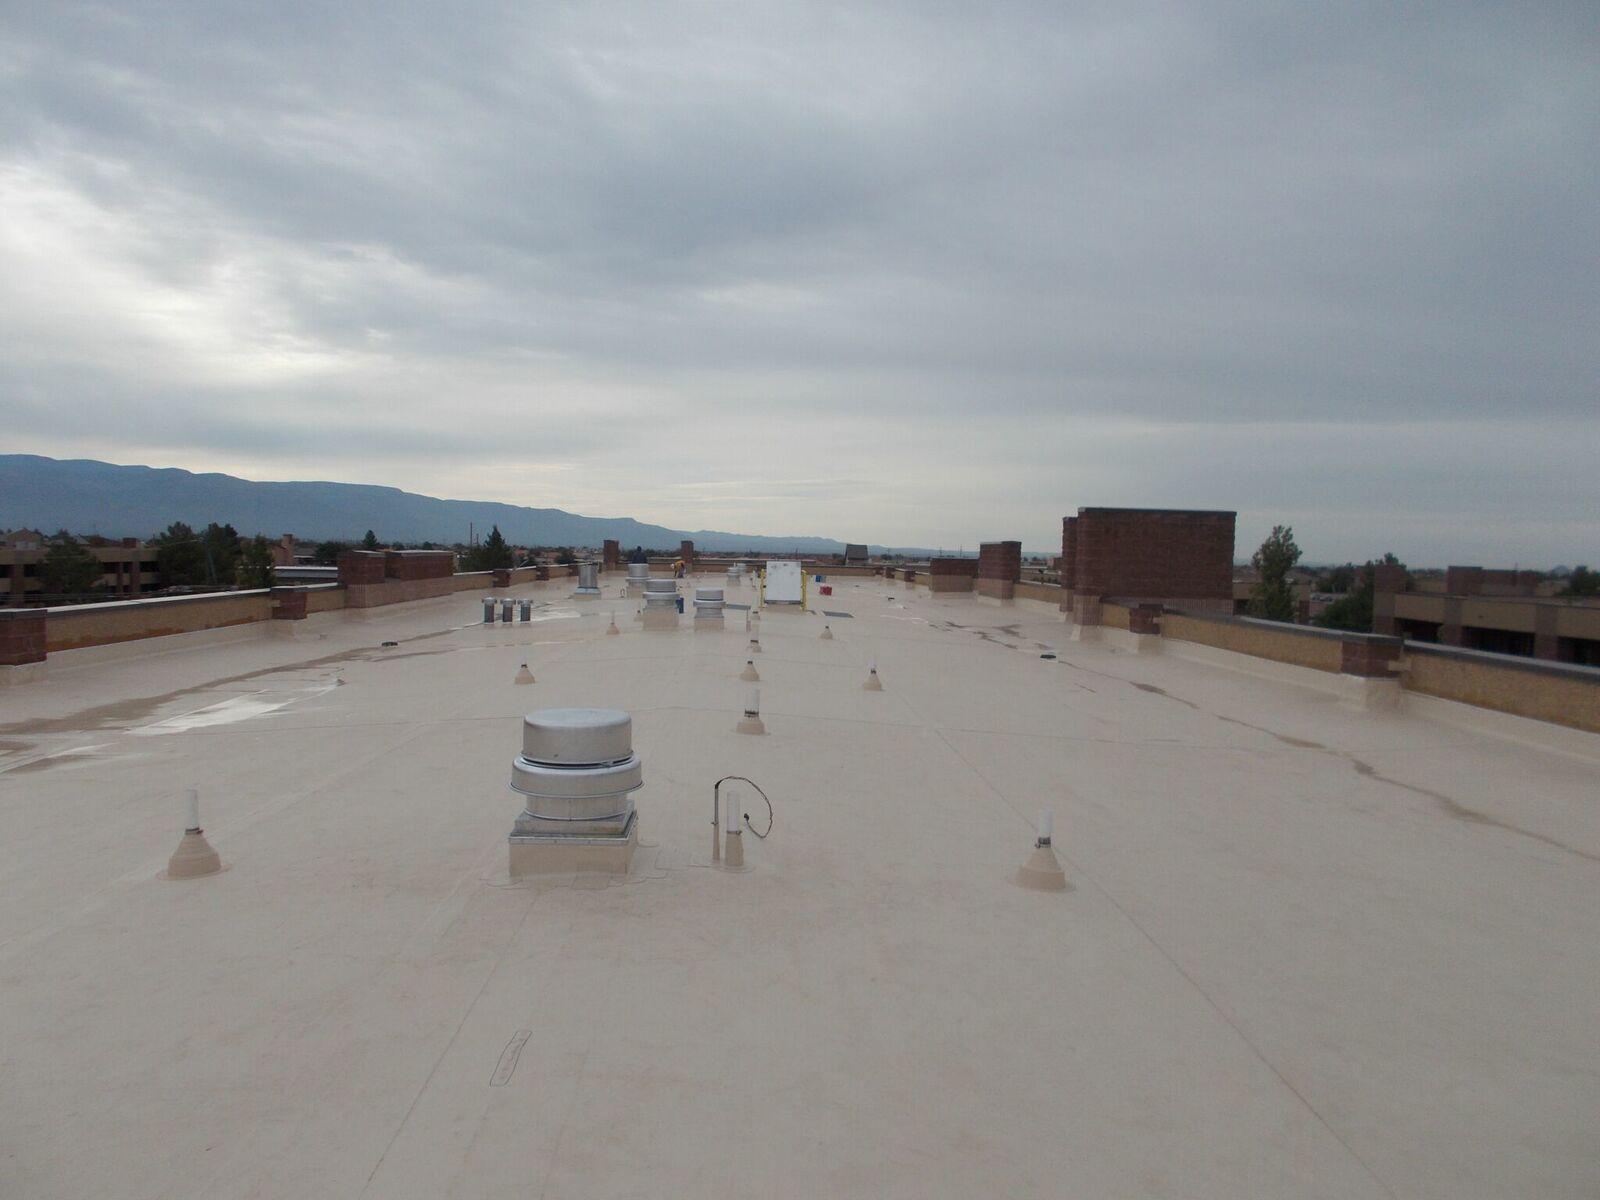 Professional Roofers & Contractors image 4